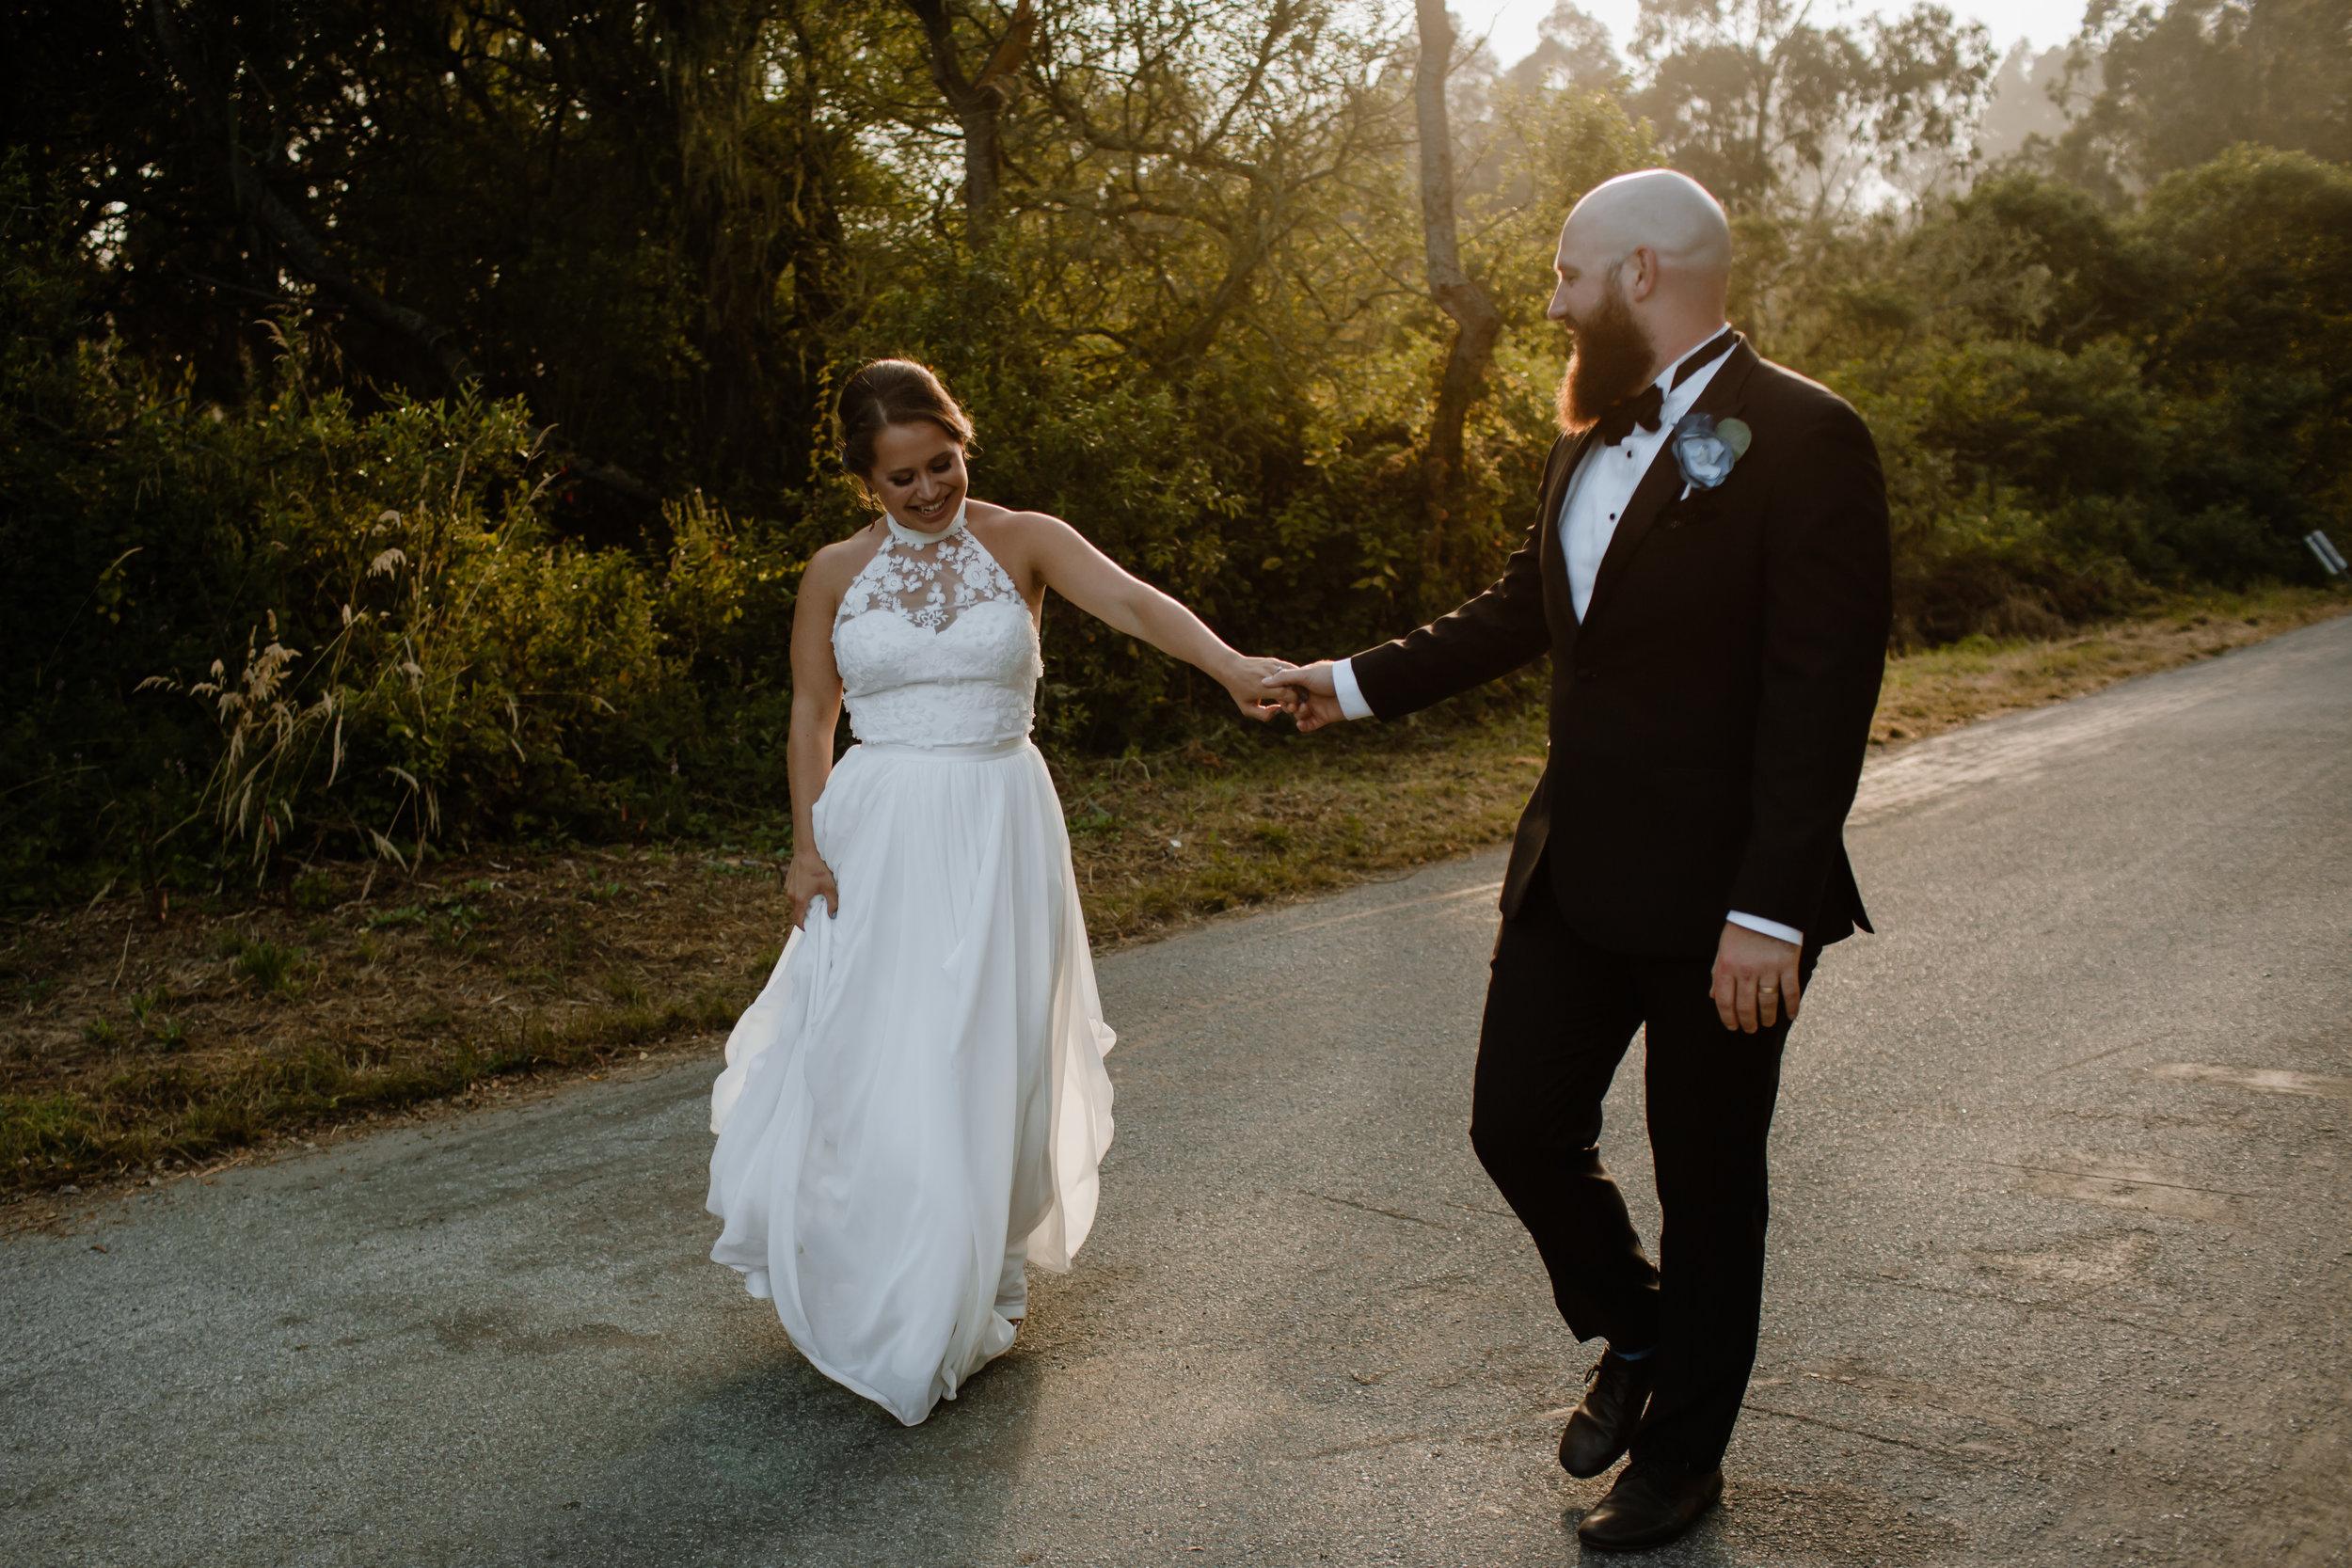 Liz and Scott Wedding - Half Moon Bay, CA - Eve Rox Photography-15.jpg